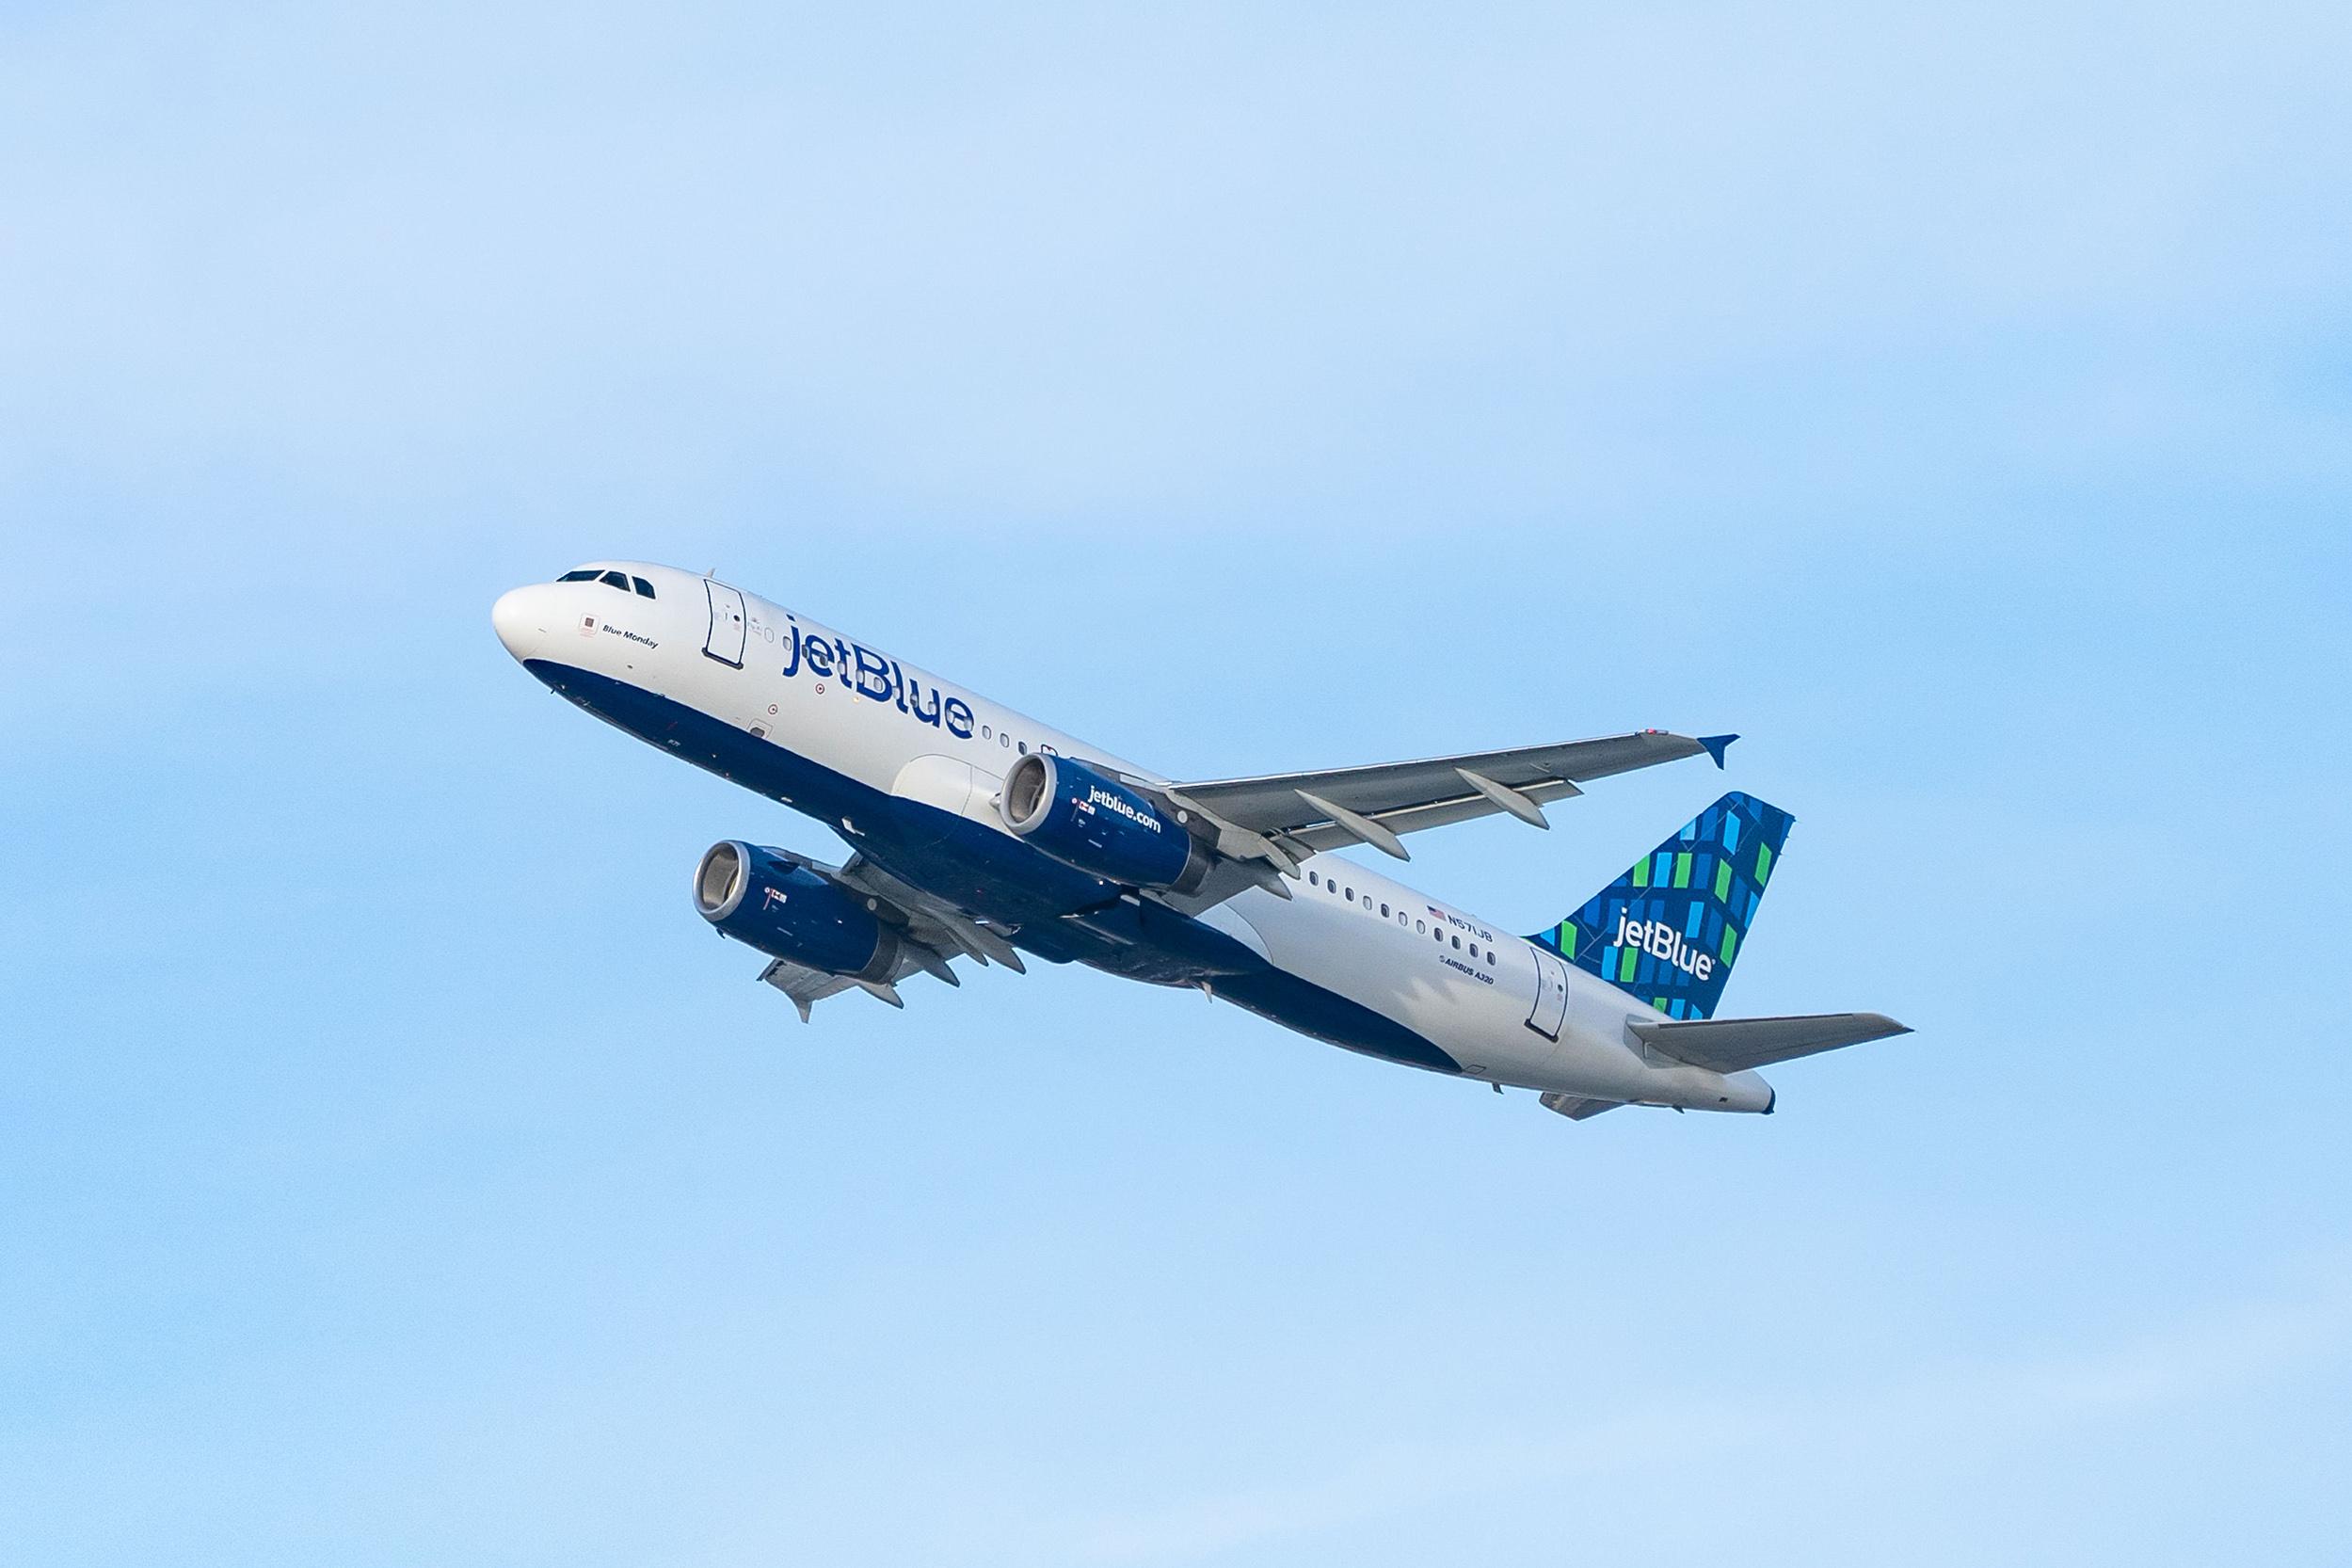 JetBlue passenger attacked flight attendant and tried to rush flight deck, FBI says